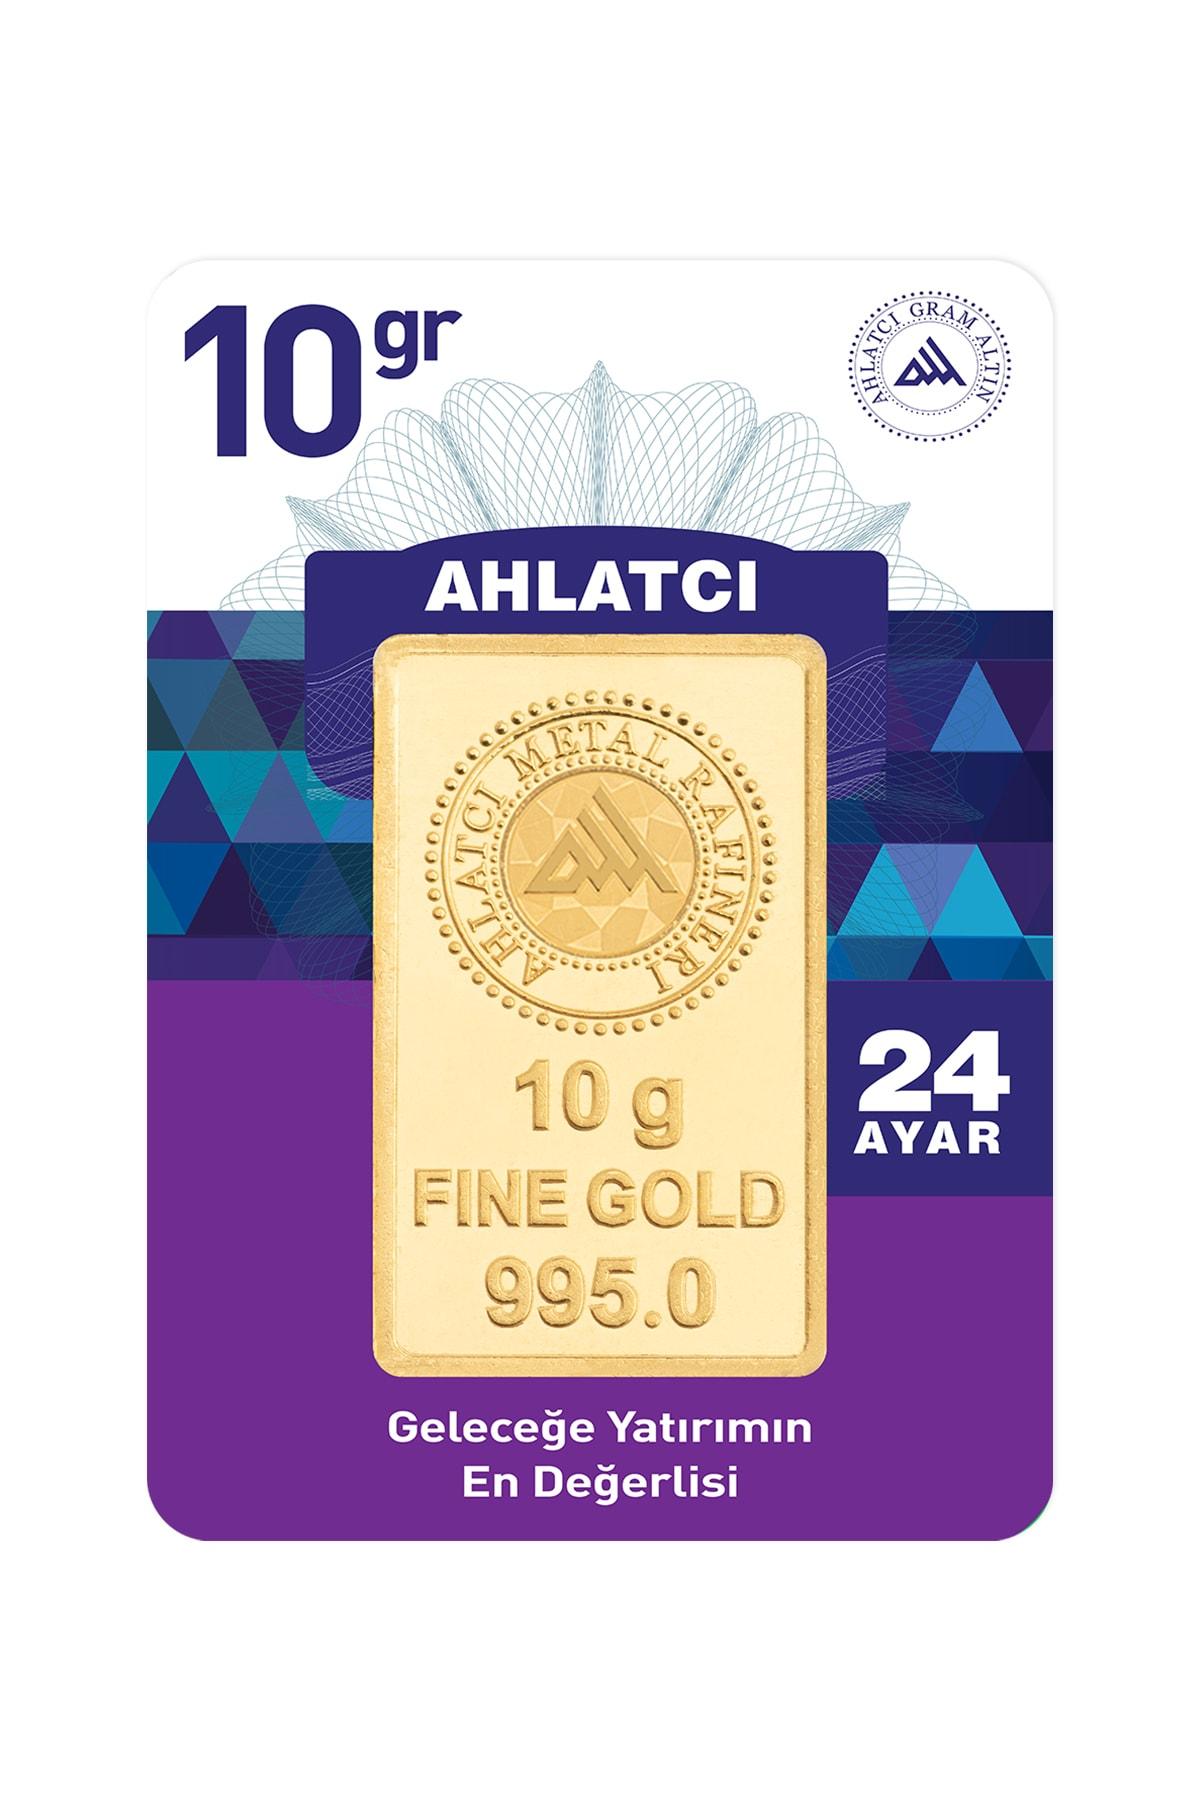 24 Ayar - 10g Altın